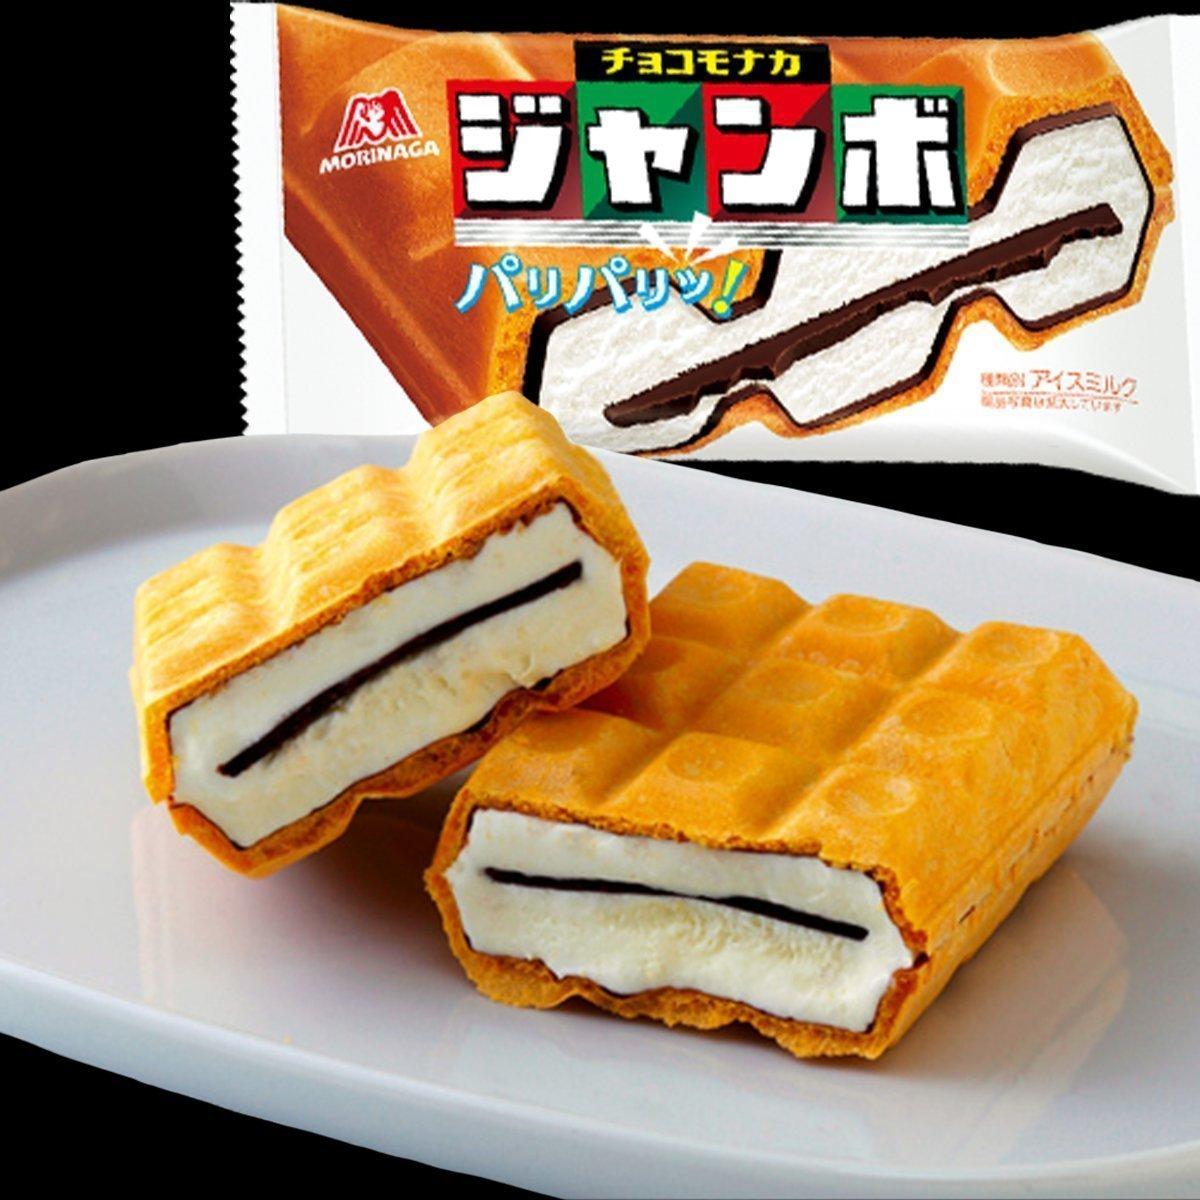 Morinaga Choco Monaka Jumbo Waffle Ice Cream (20 pcs) /  チョコモナカジャンボ 20パック入  業務用箱買い 